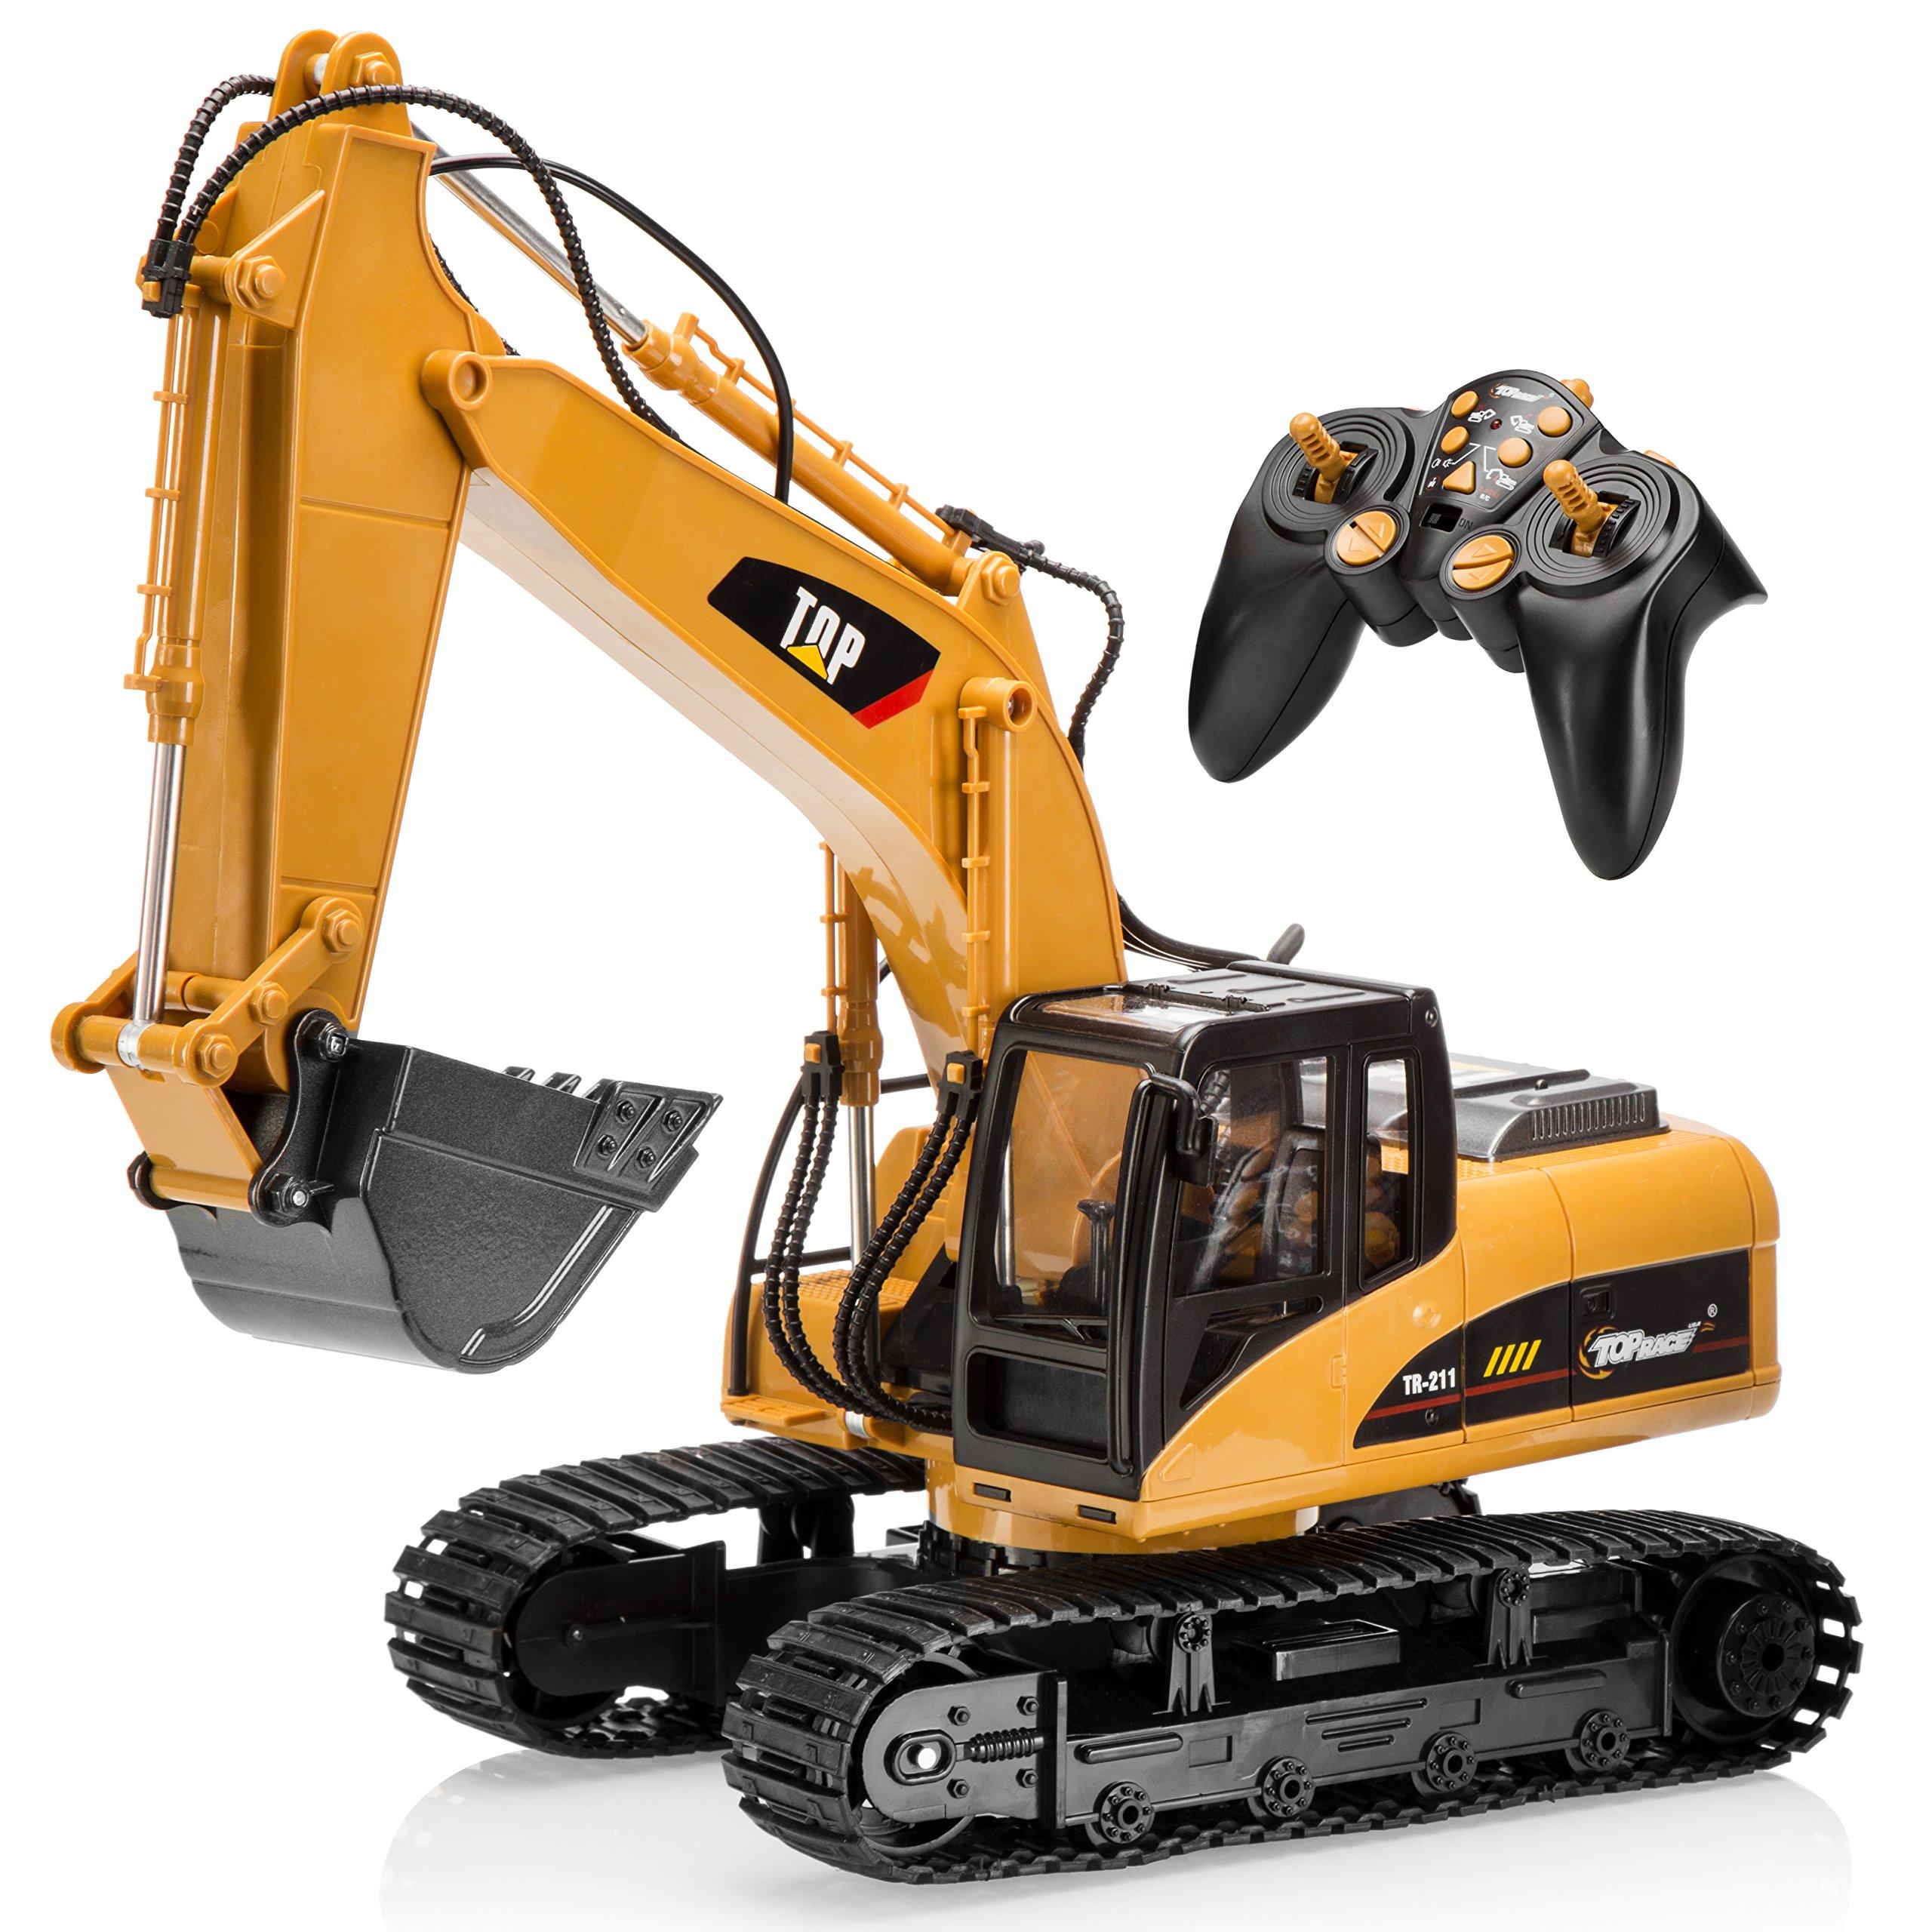 Remote Control Excavator Construction Toy Rc Caterpillar